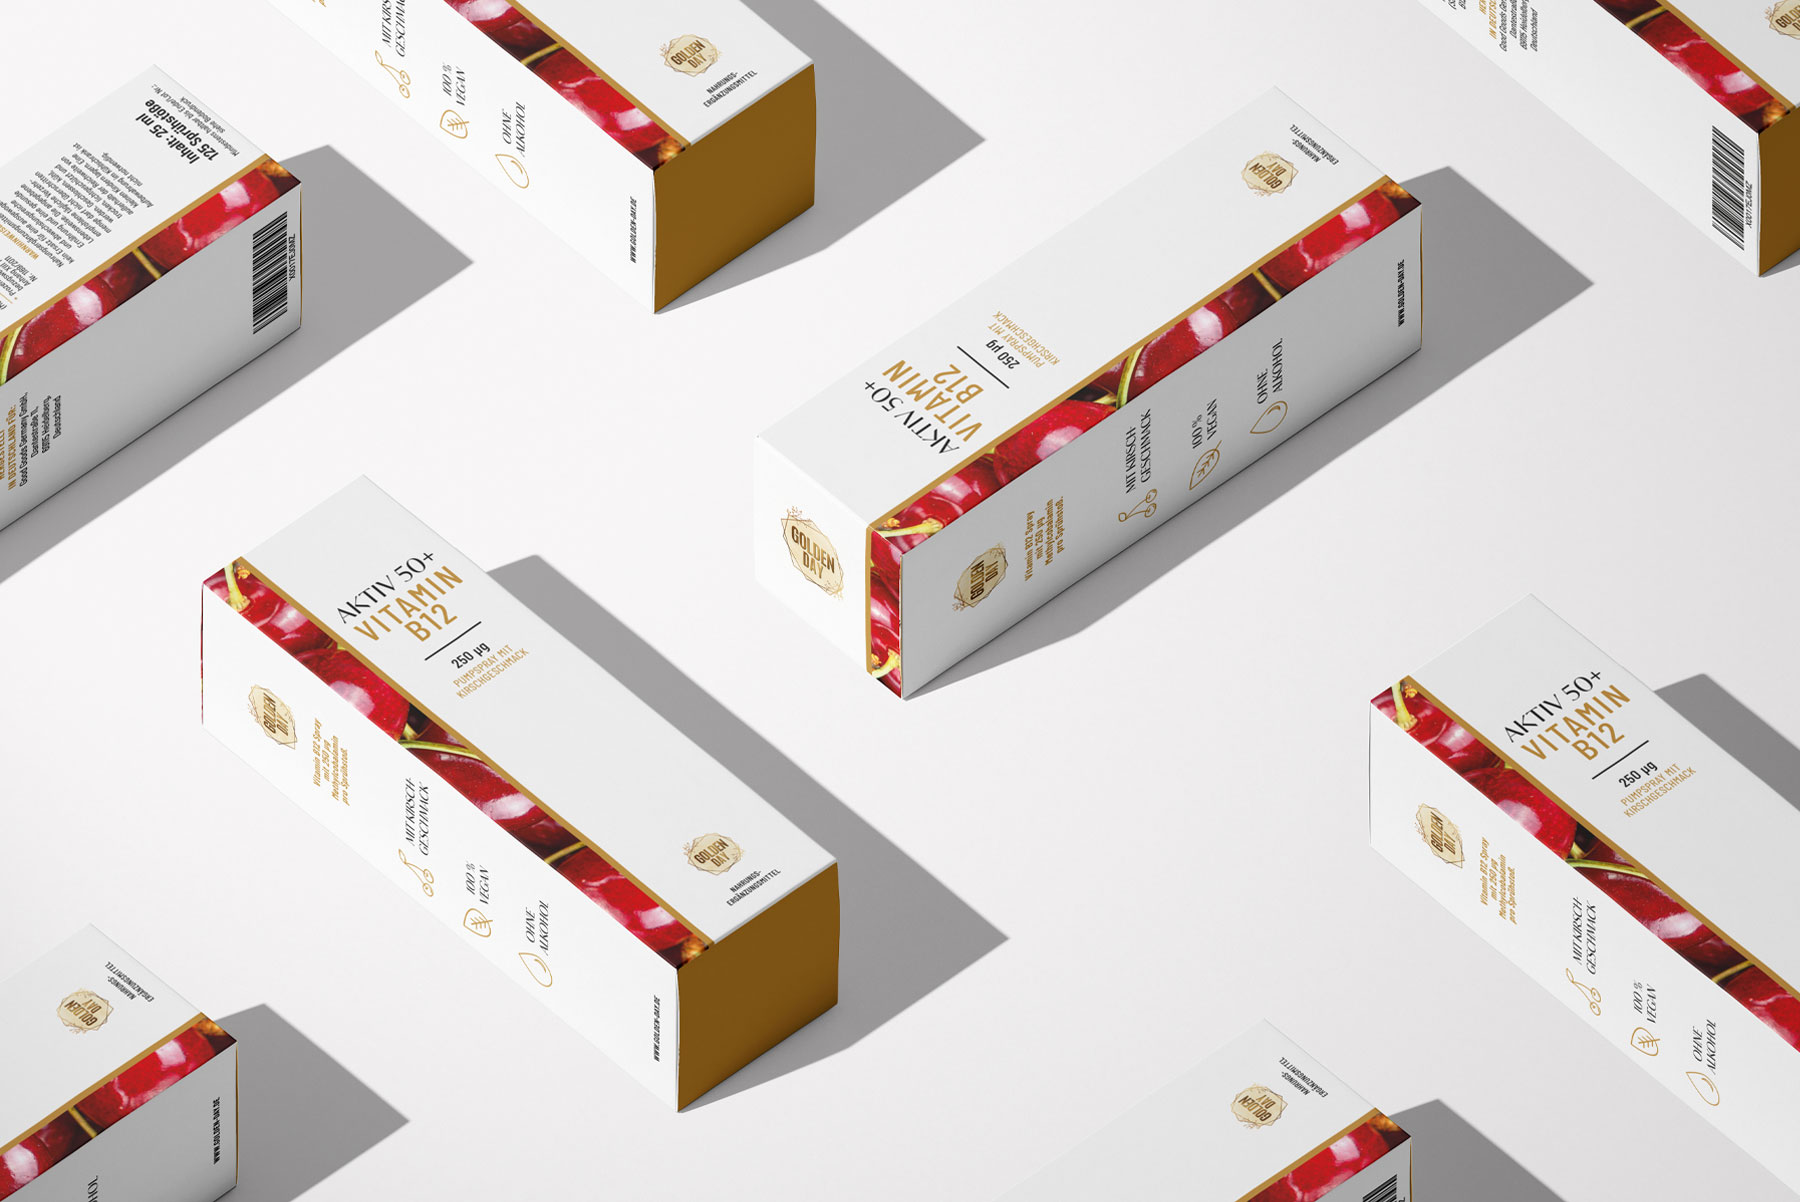 Nahrungsergänzungsmittel Verpackungsdesign Senioren Vitamin B12